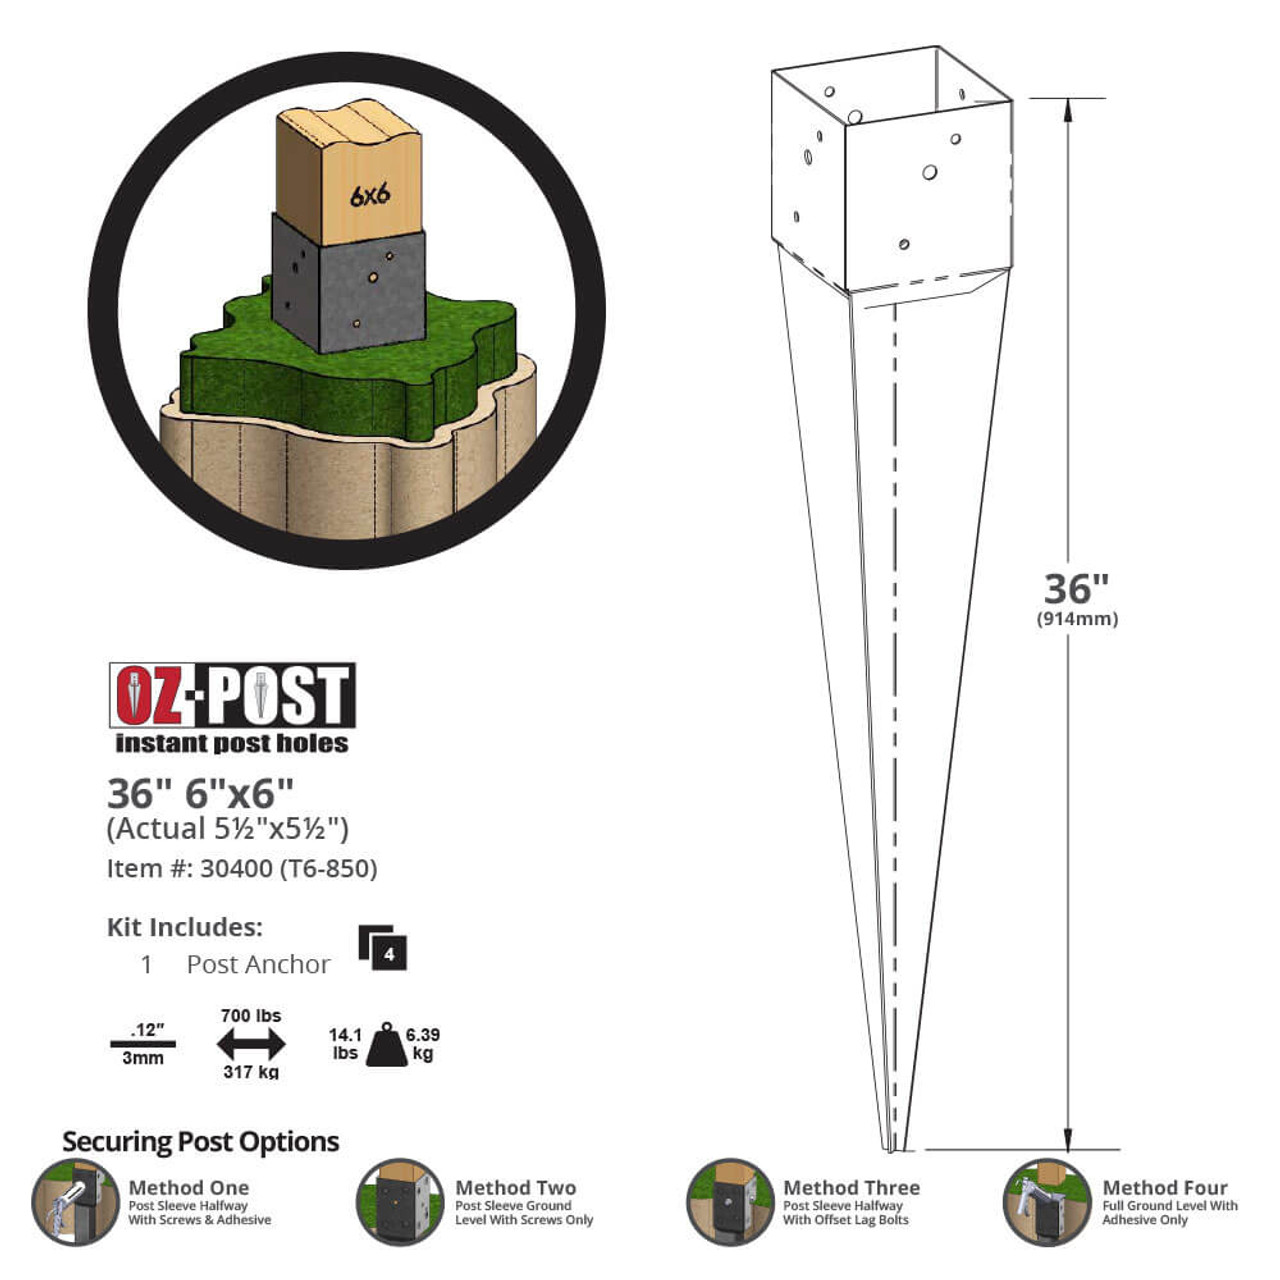 OZ-Post T6-850 Dimension Drawing